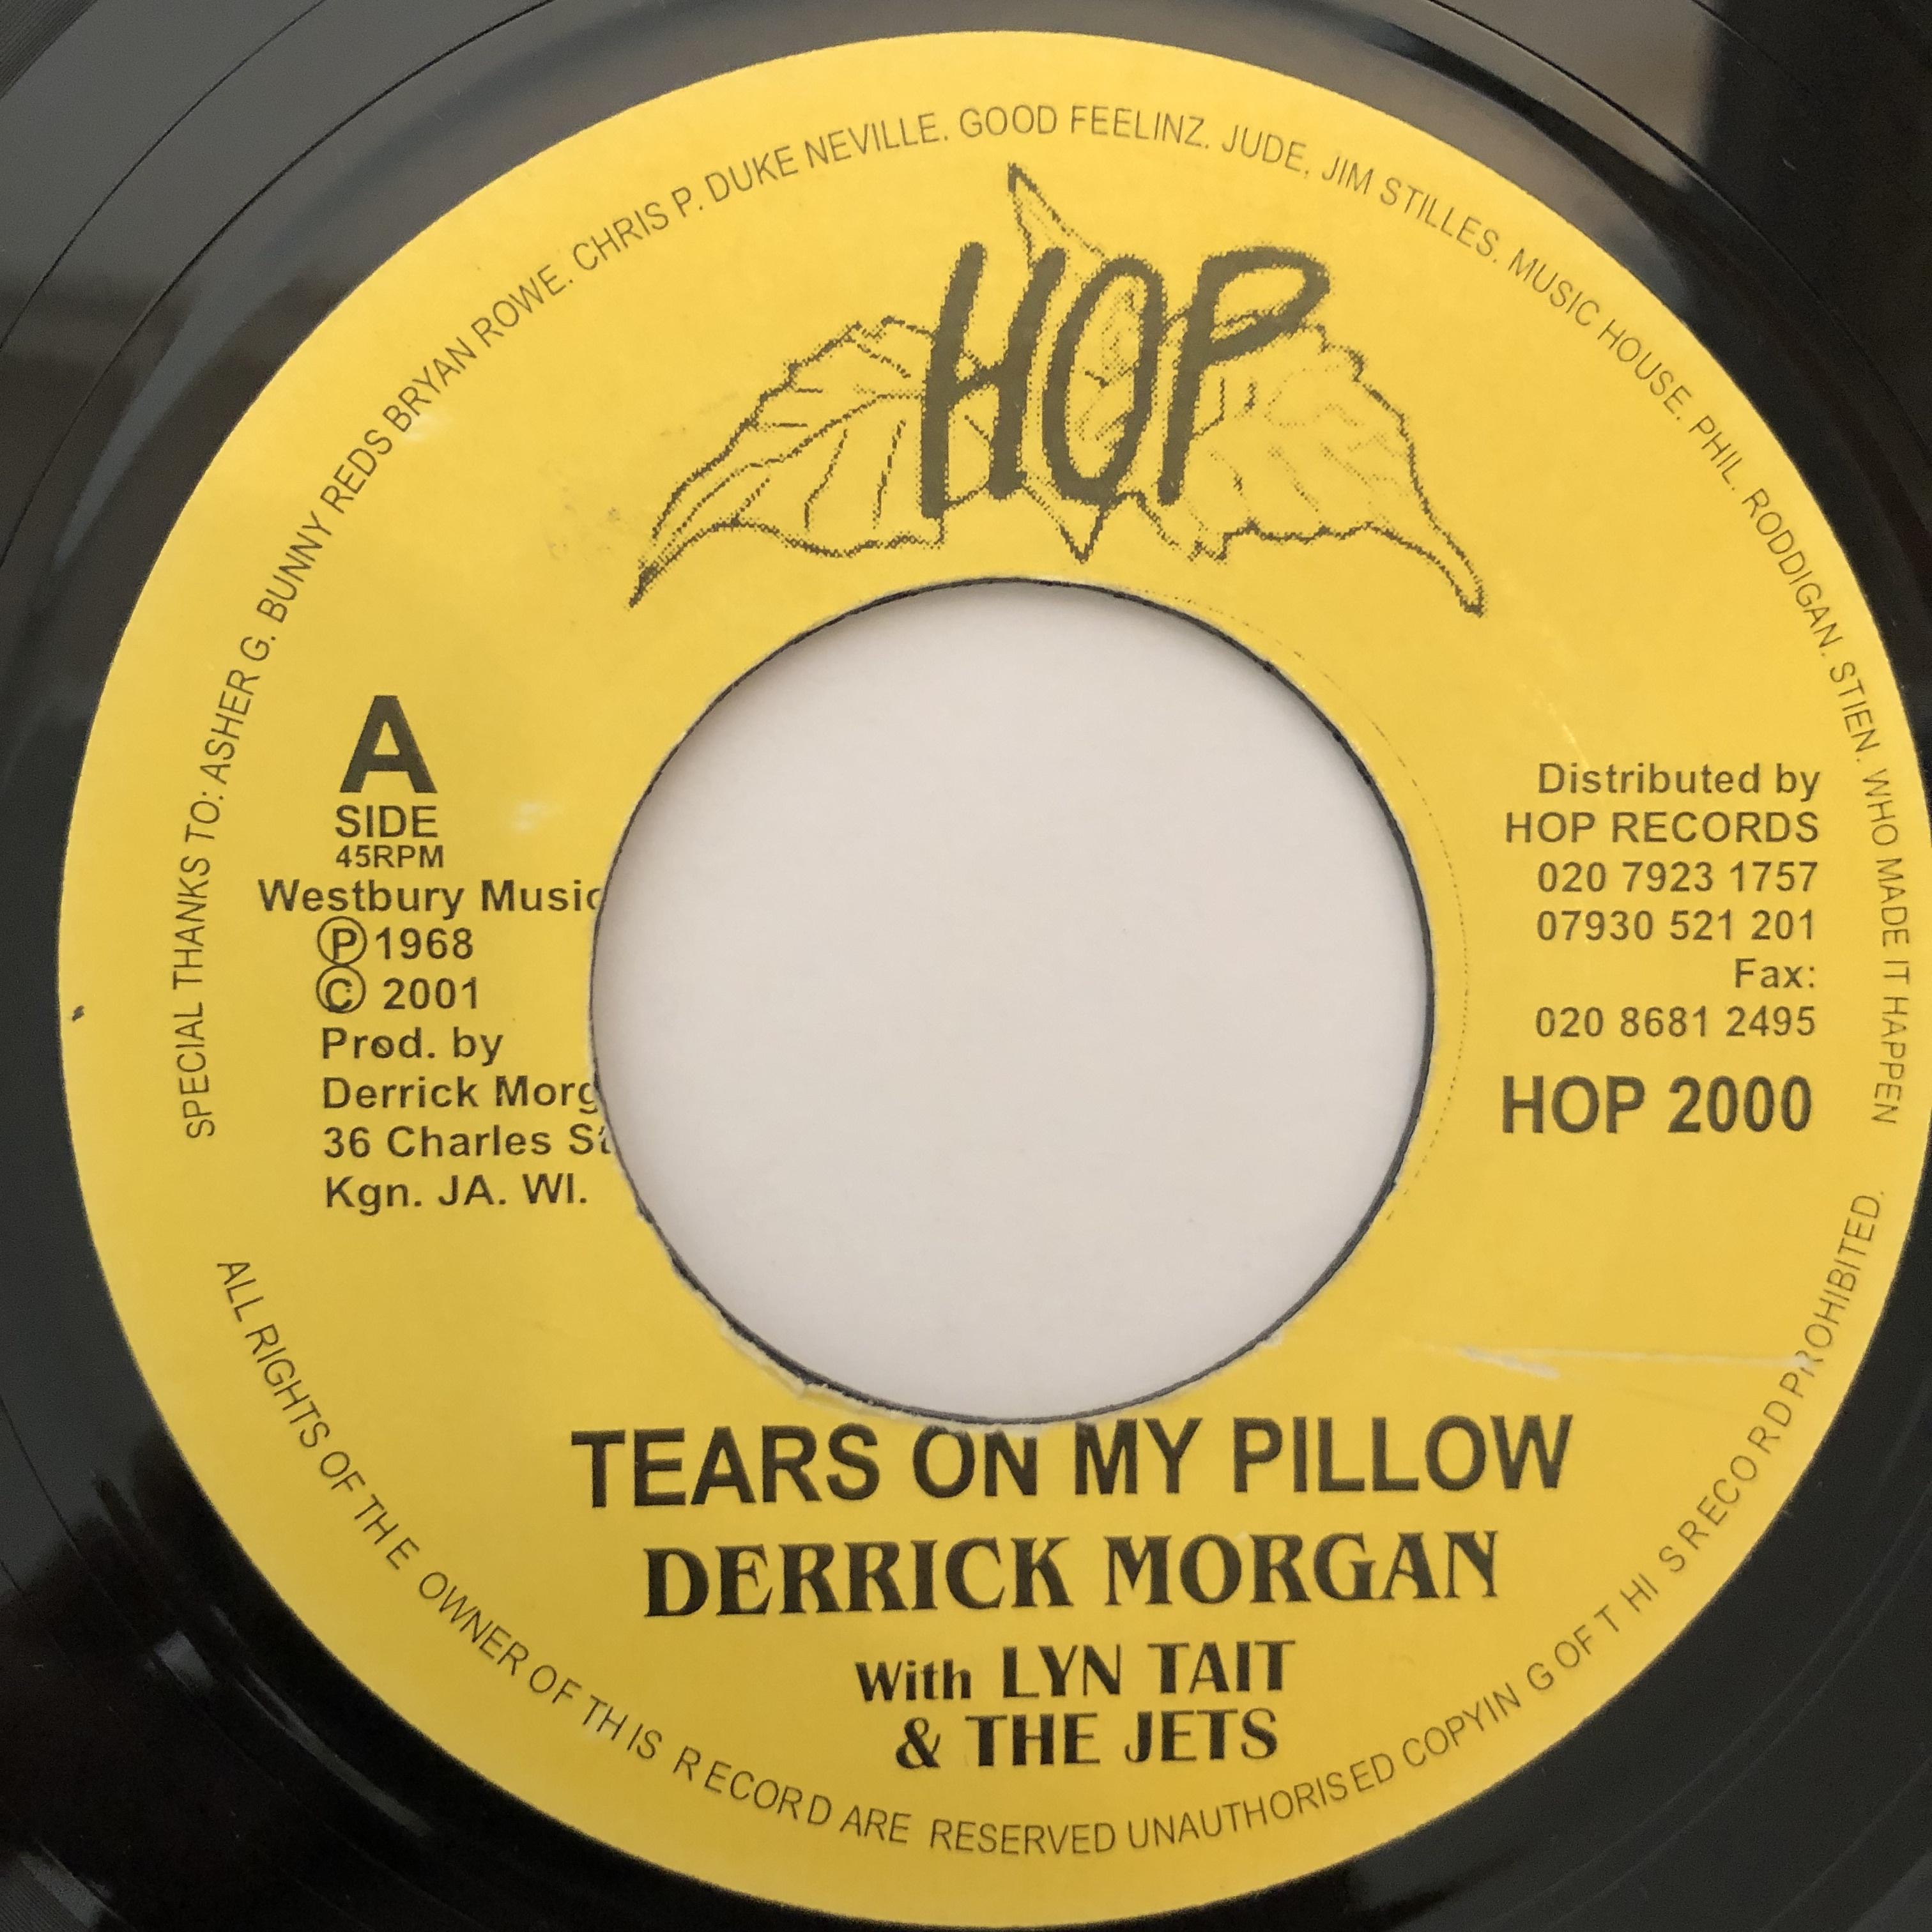 Derrick Morgan(デリックモーガン) - Tears On My Pillow【7-20247】